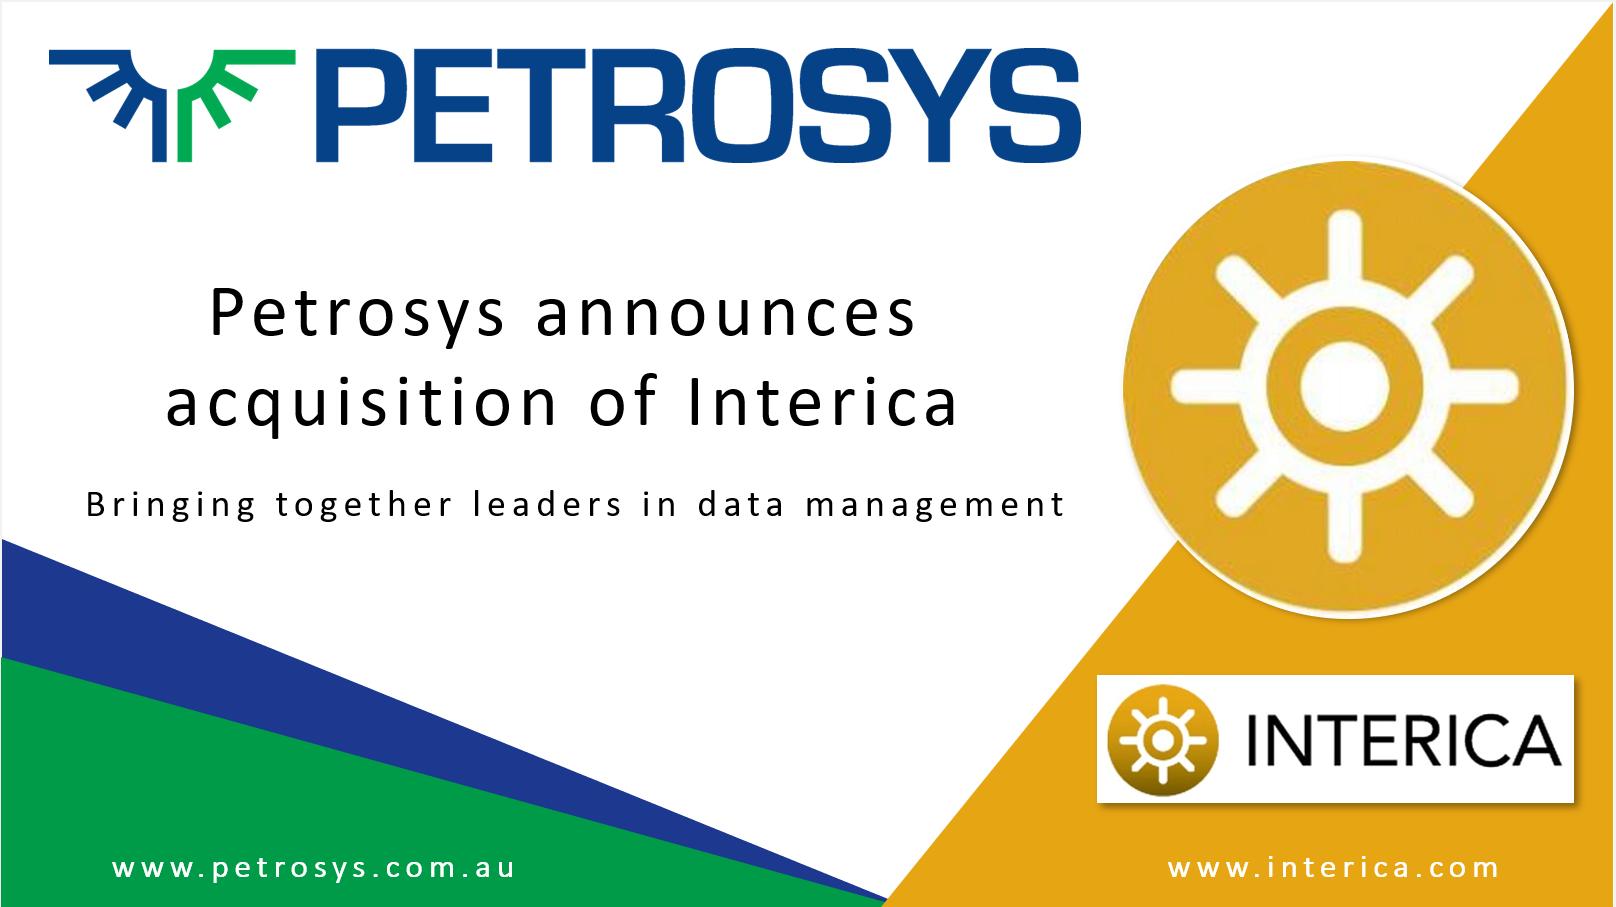 Petrosys Announces Acquisition – Interica